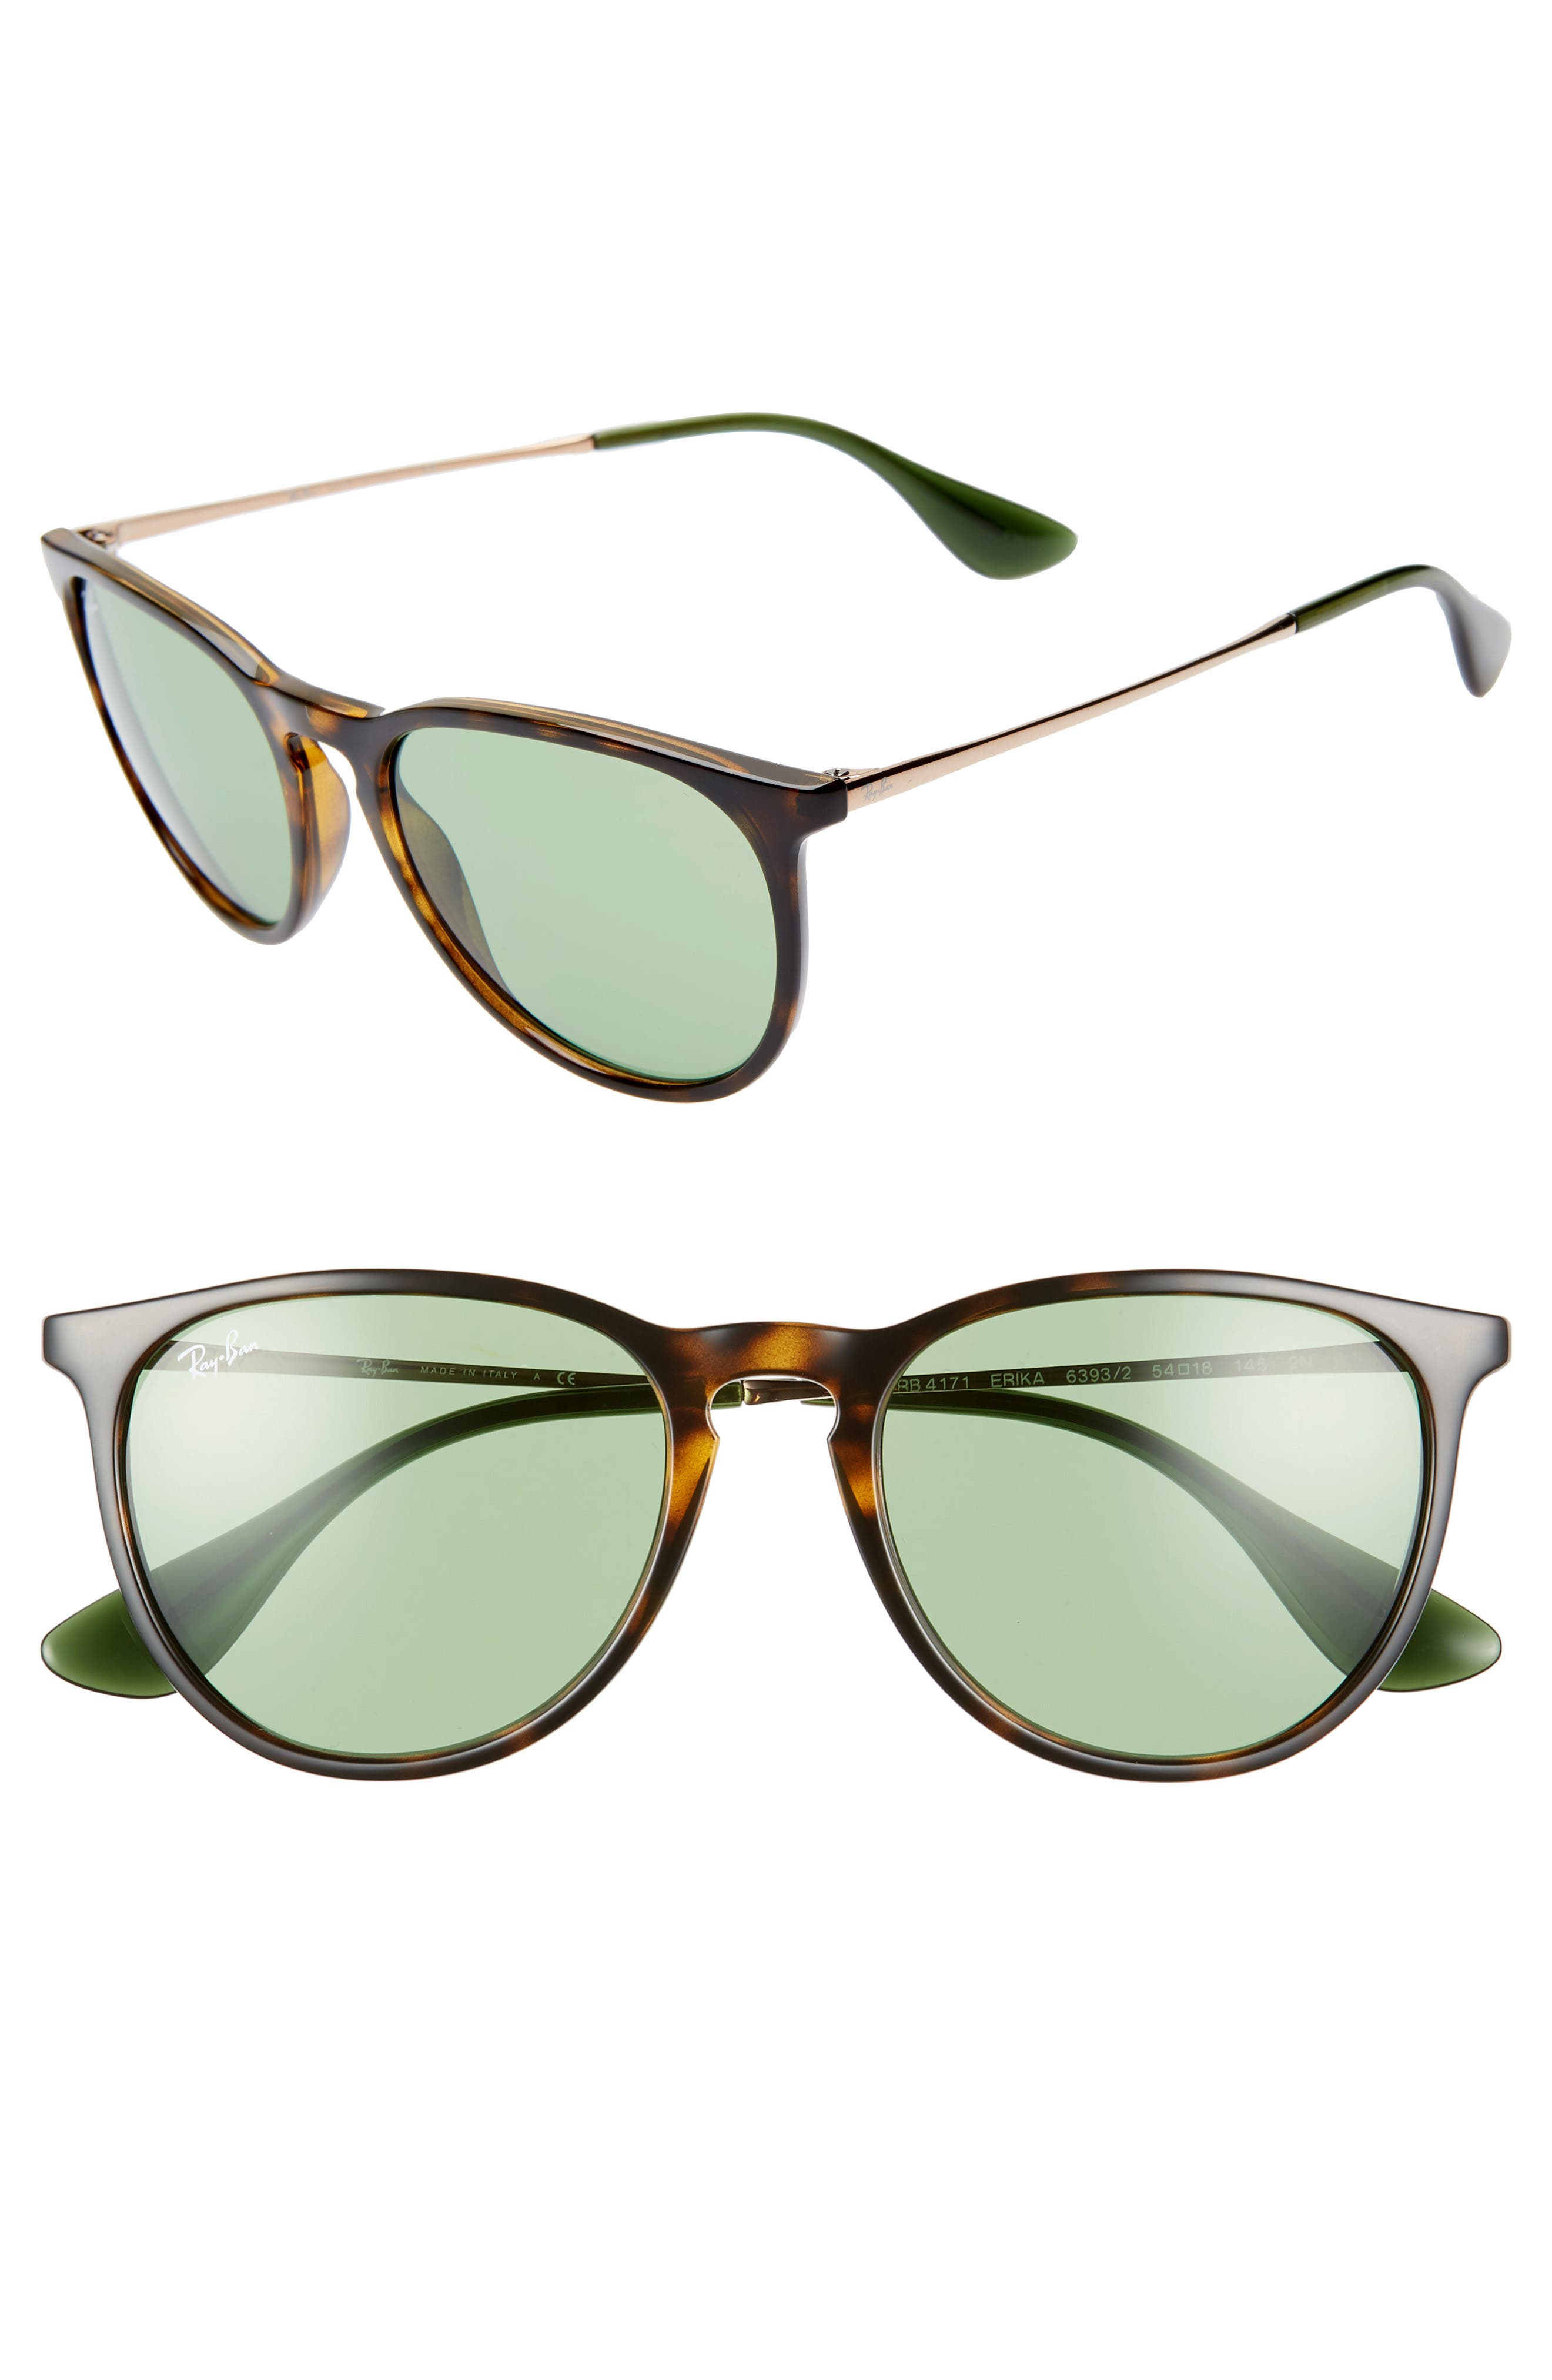 RAY-BAN, Erika Classic 54mm Sunglasses, Main thumbnail 1, color, HAVANA/ GREEN SOLID